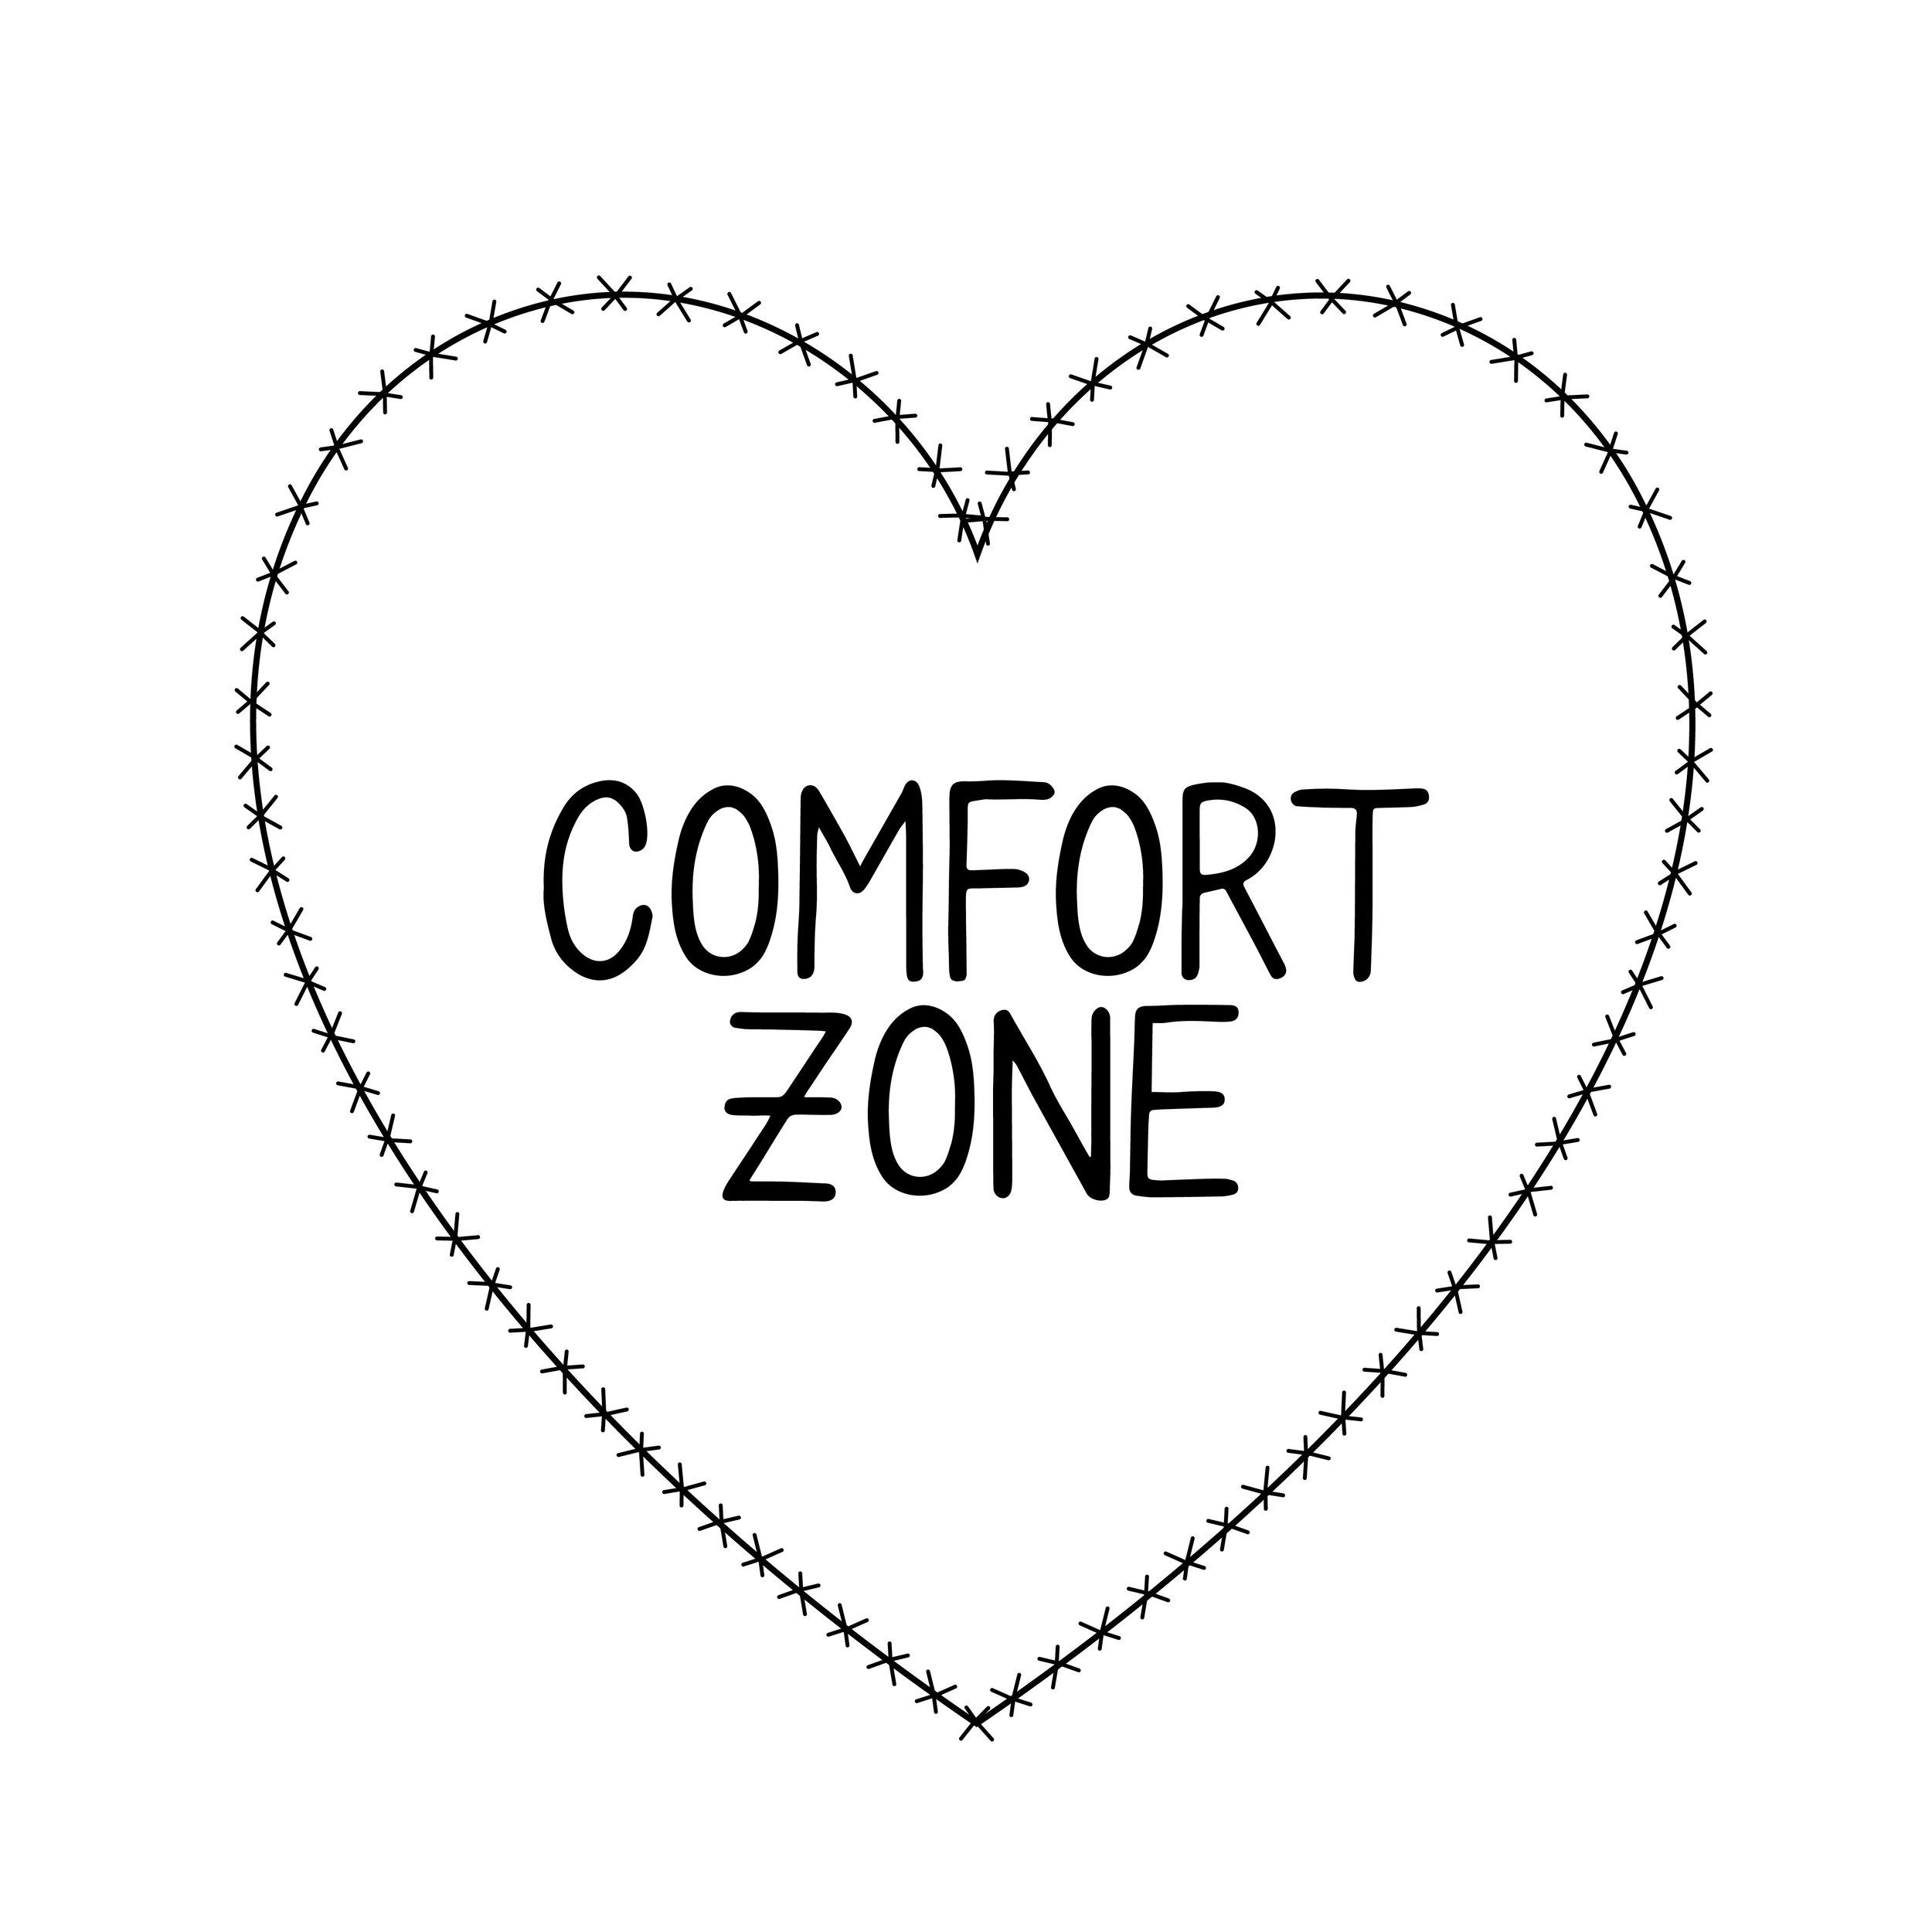 comfortzone-01.jpg